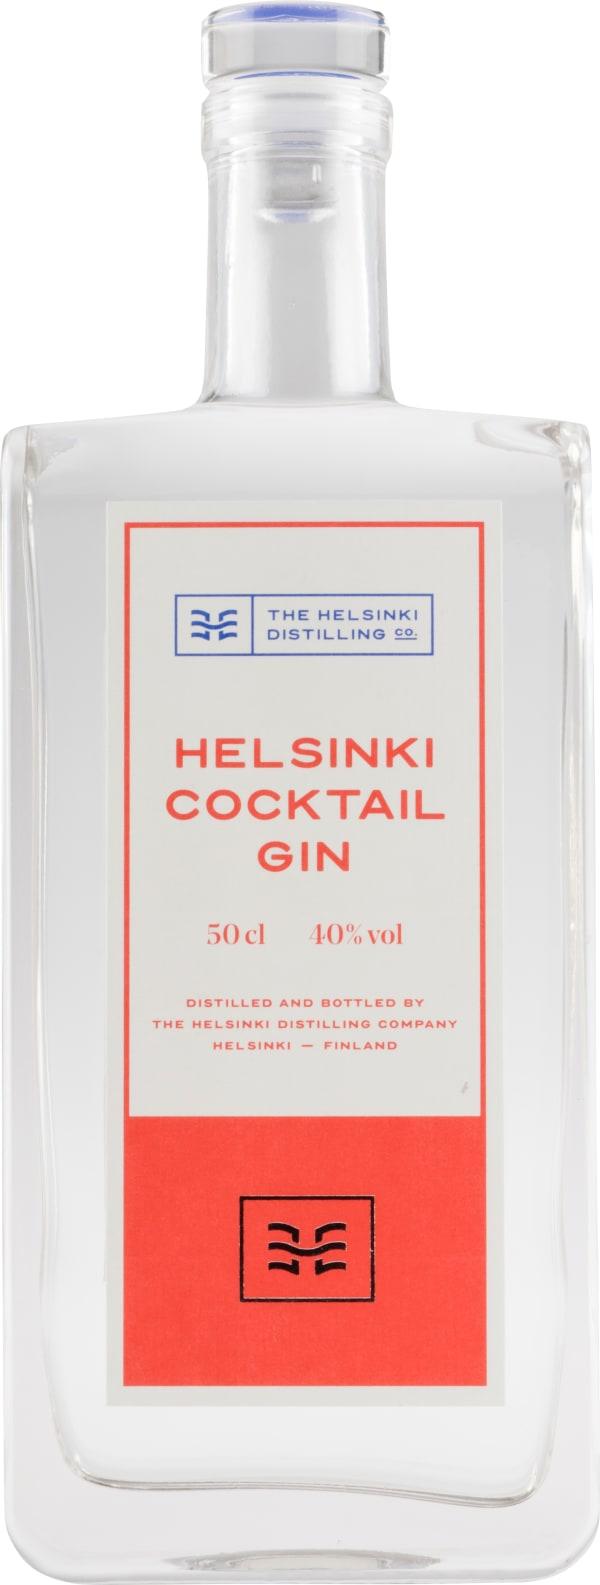 Helsinki Distilling Company Cocktail Gin